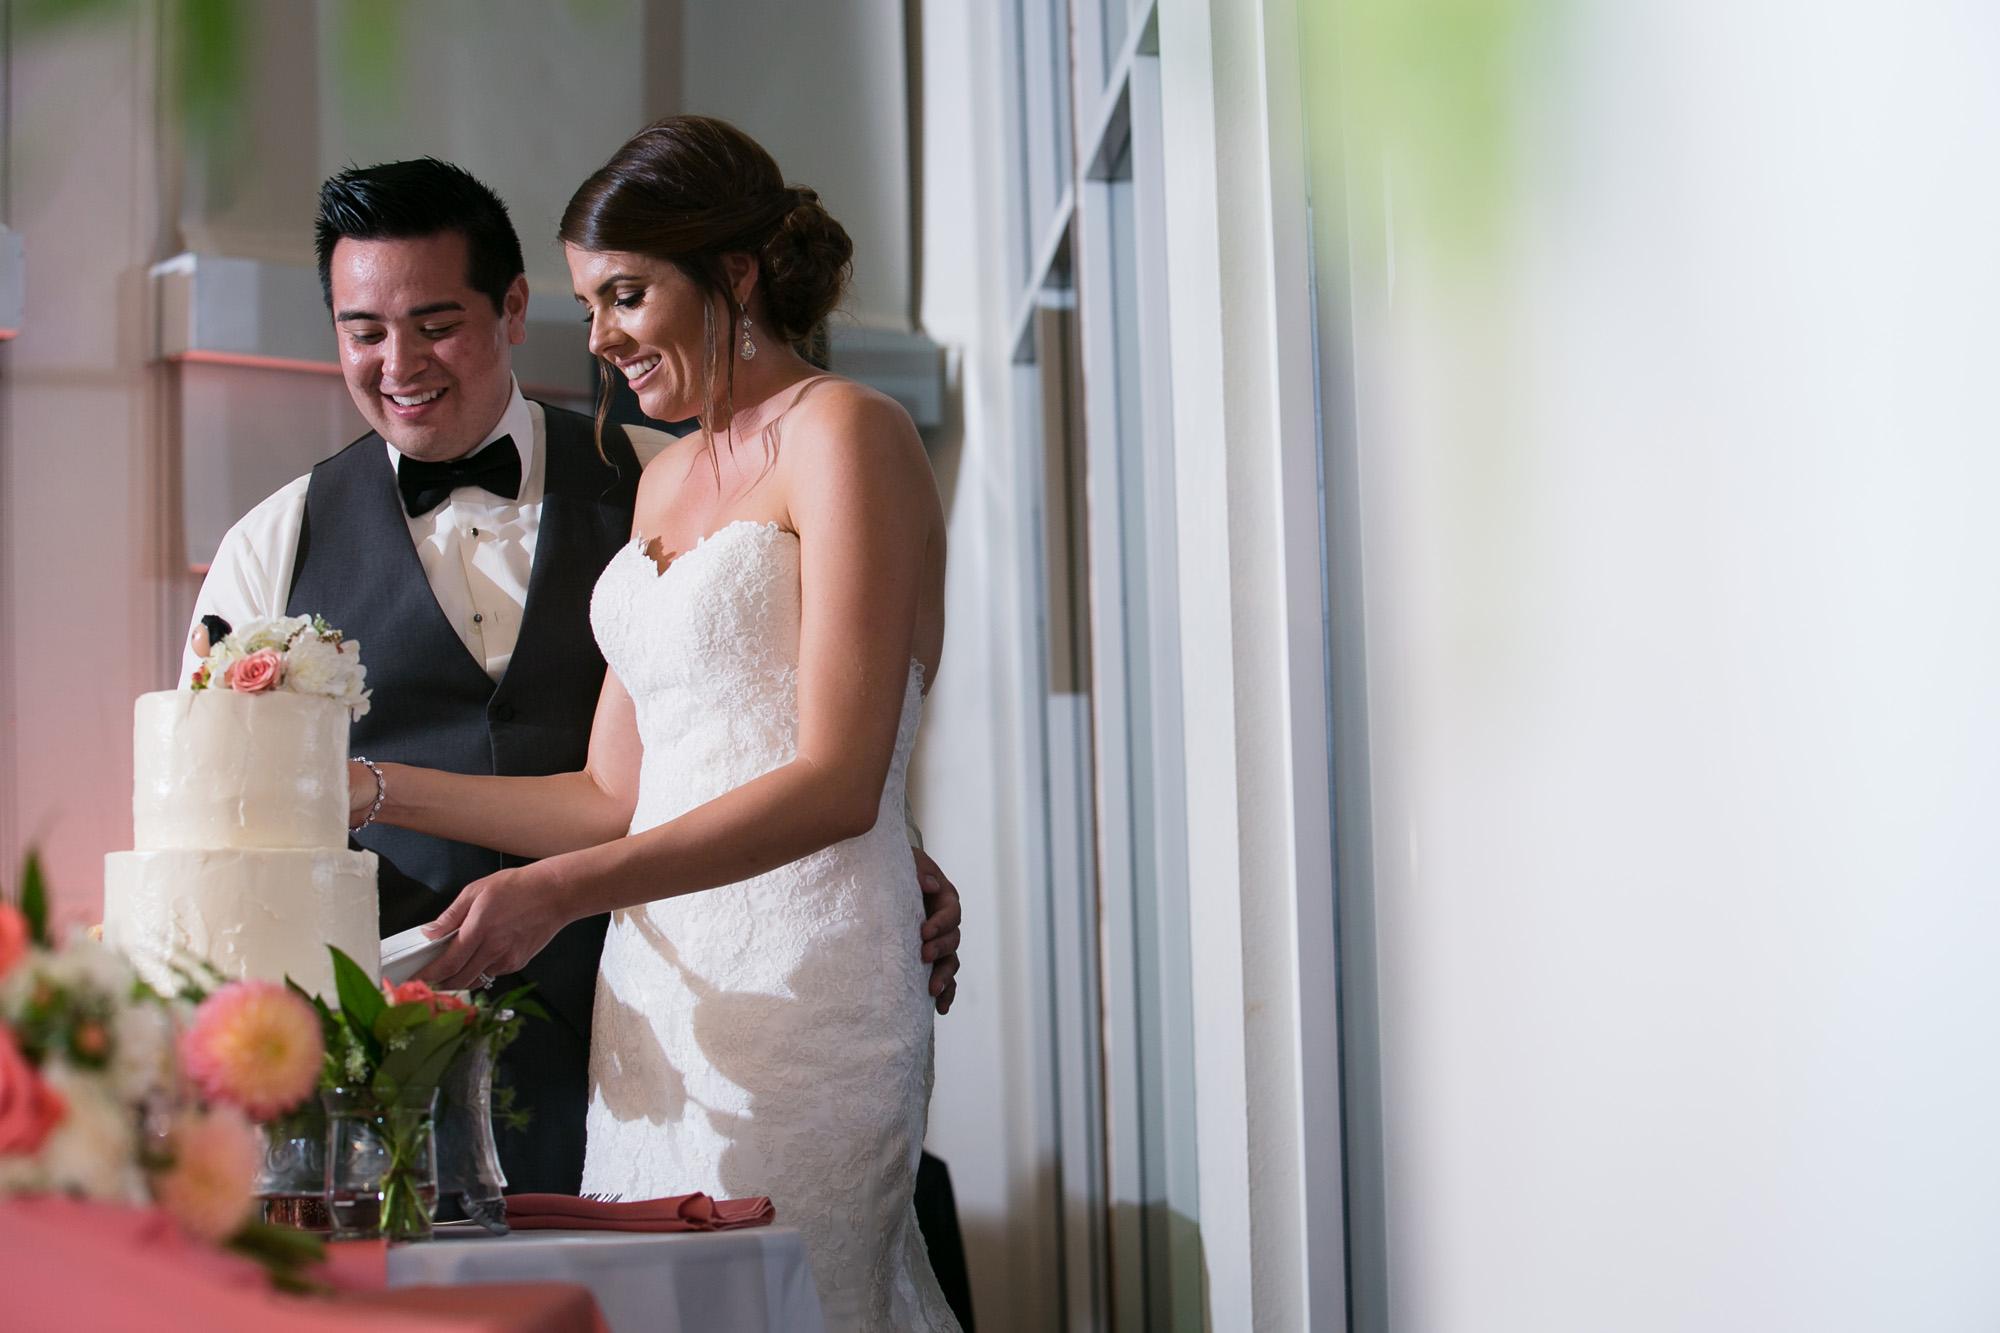 Geoff Kowalchuk BM Wedding Photography-022.jpg